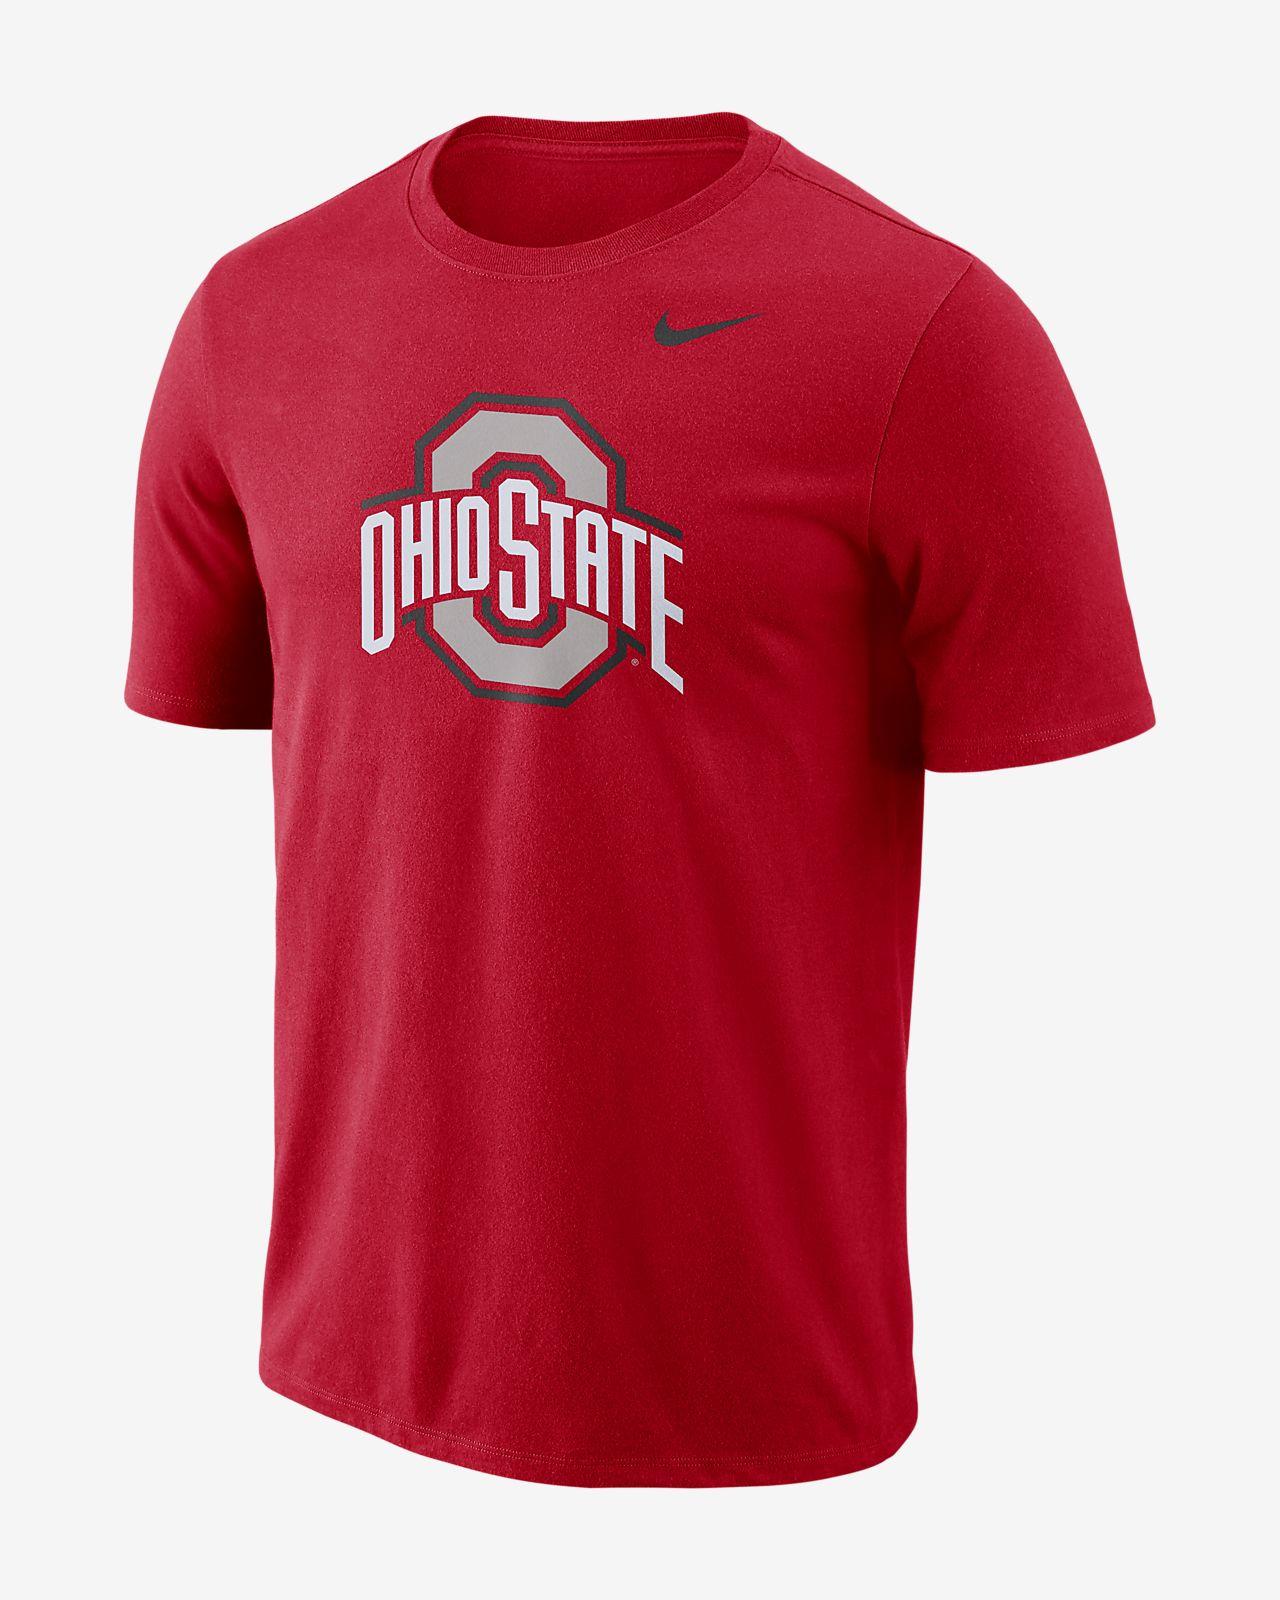 Nike College Logo (Ohio State) Men's T-Shirt